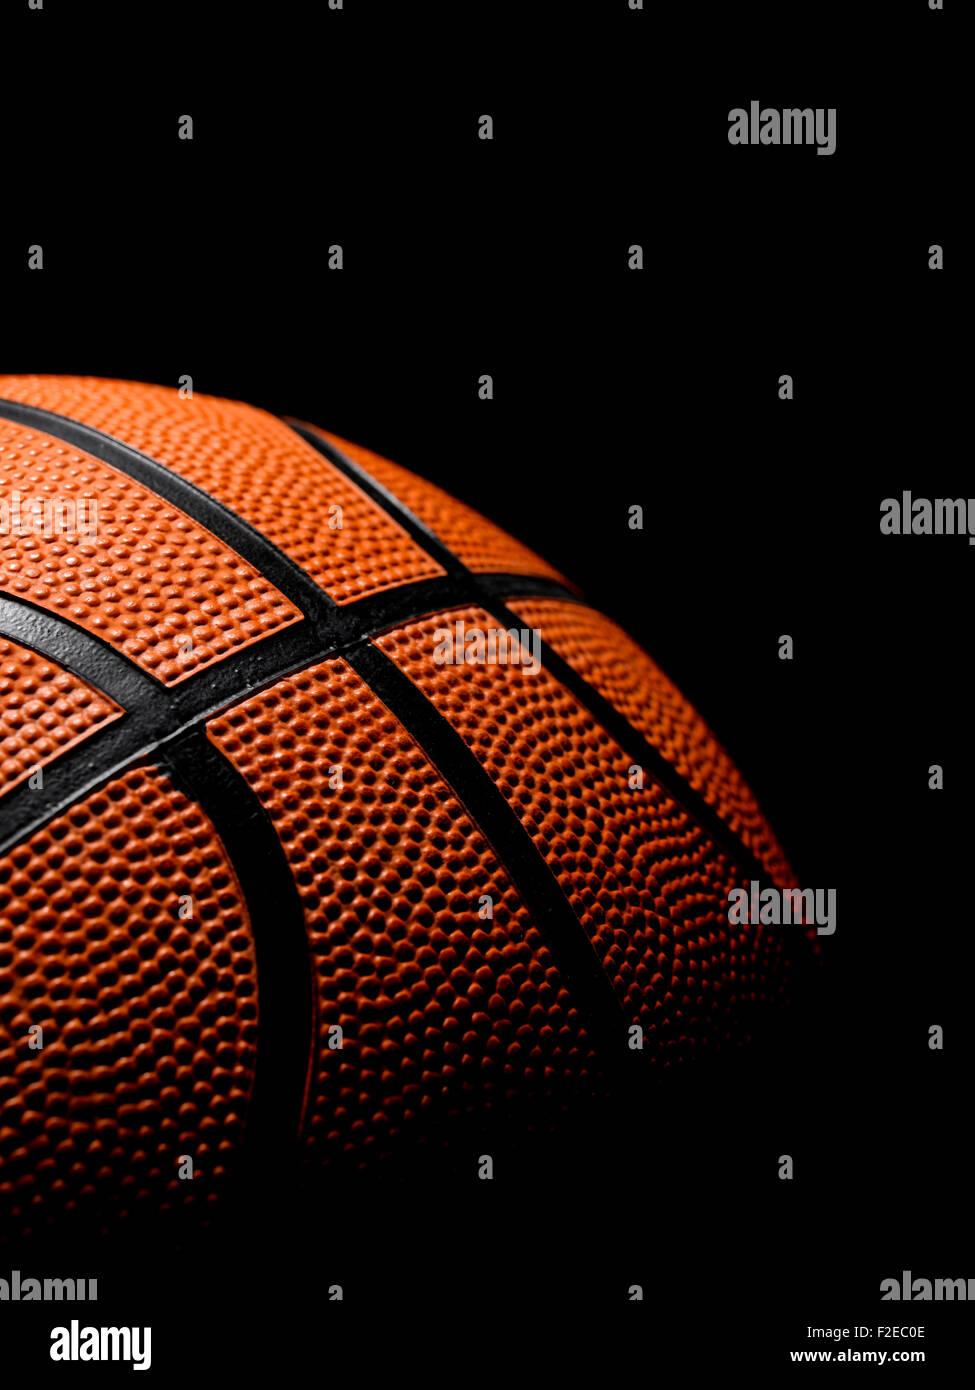 Single Basketball on a black background - Stock Image